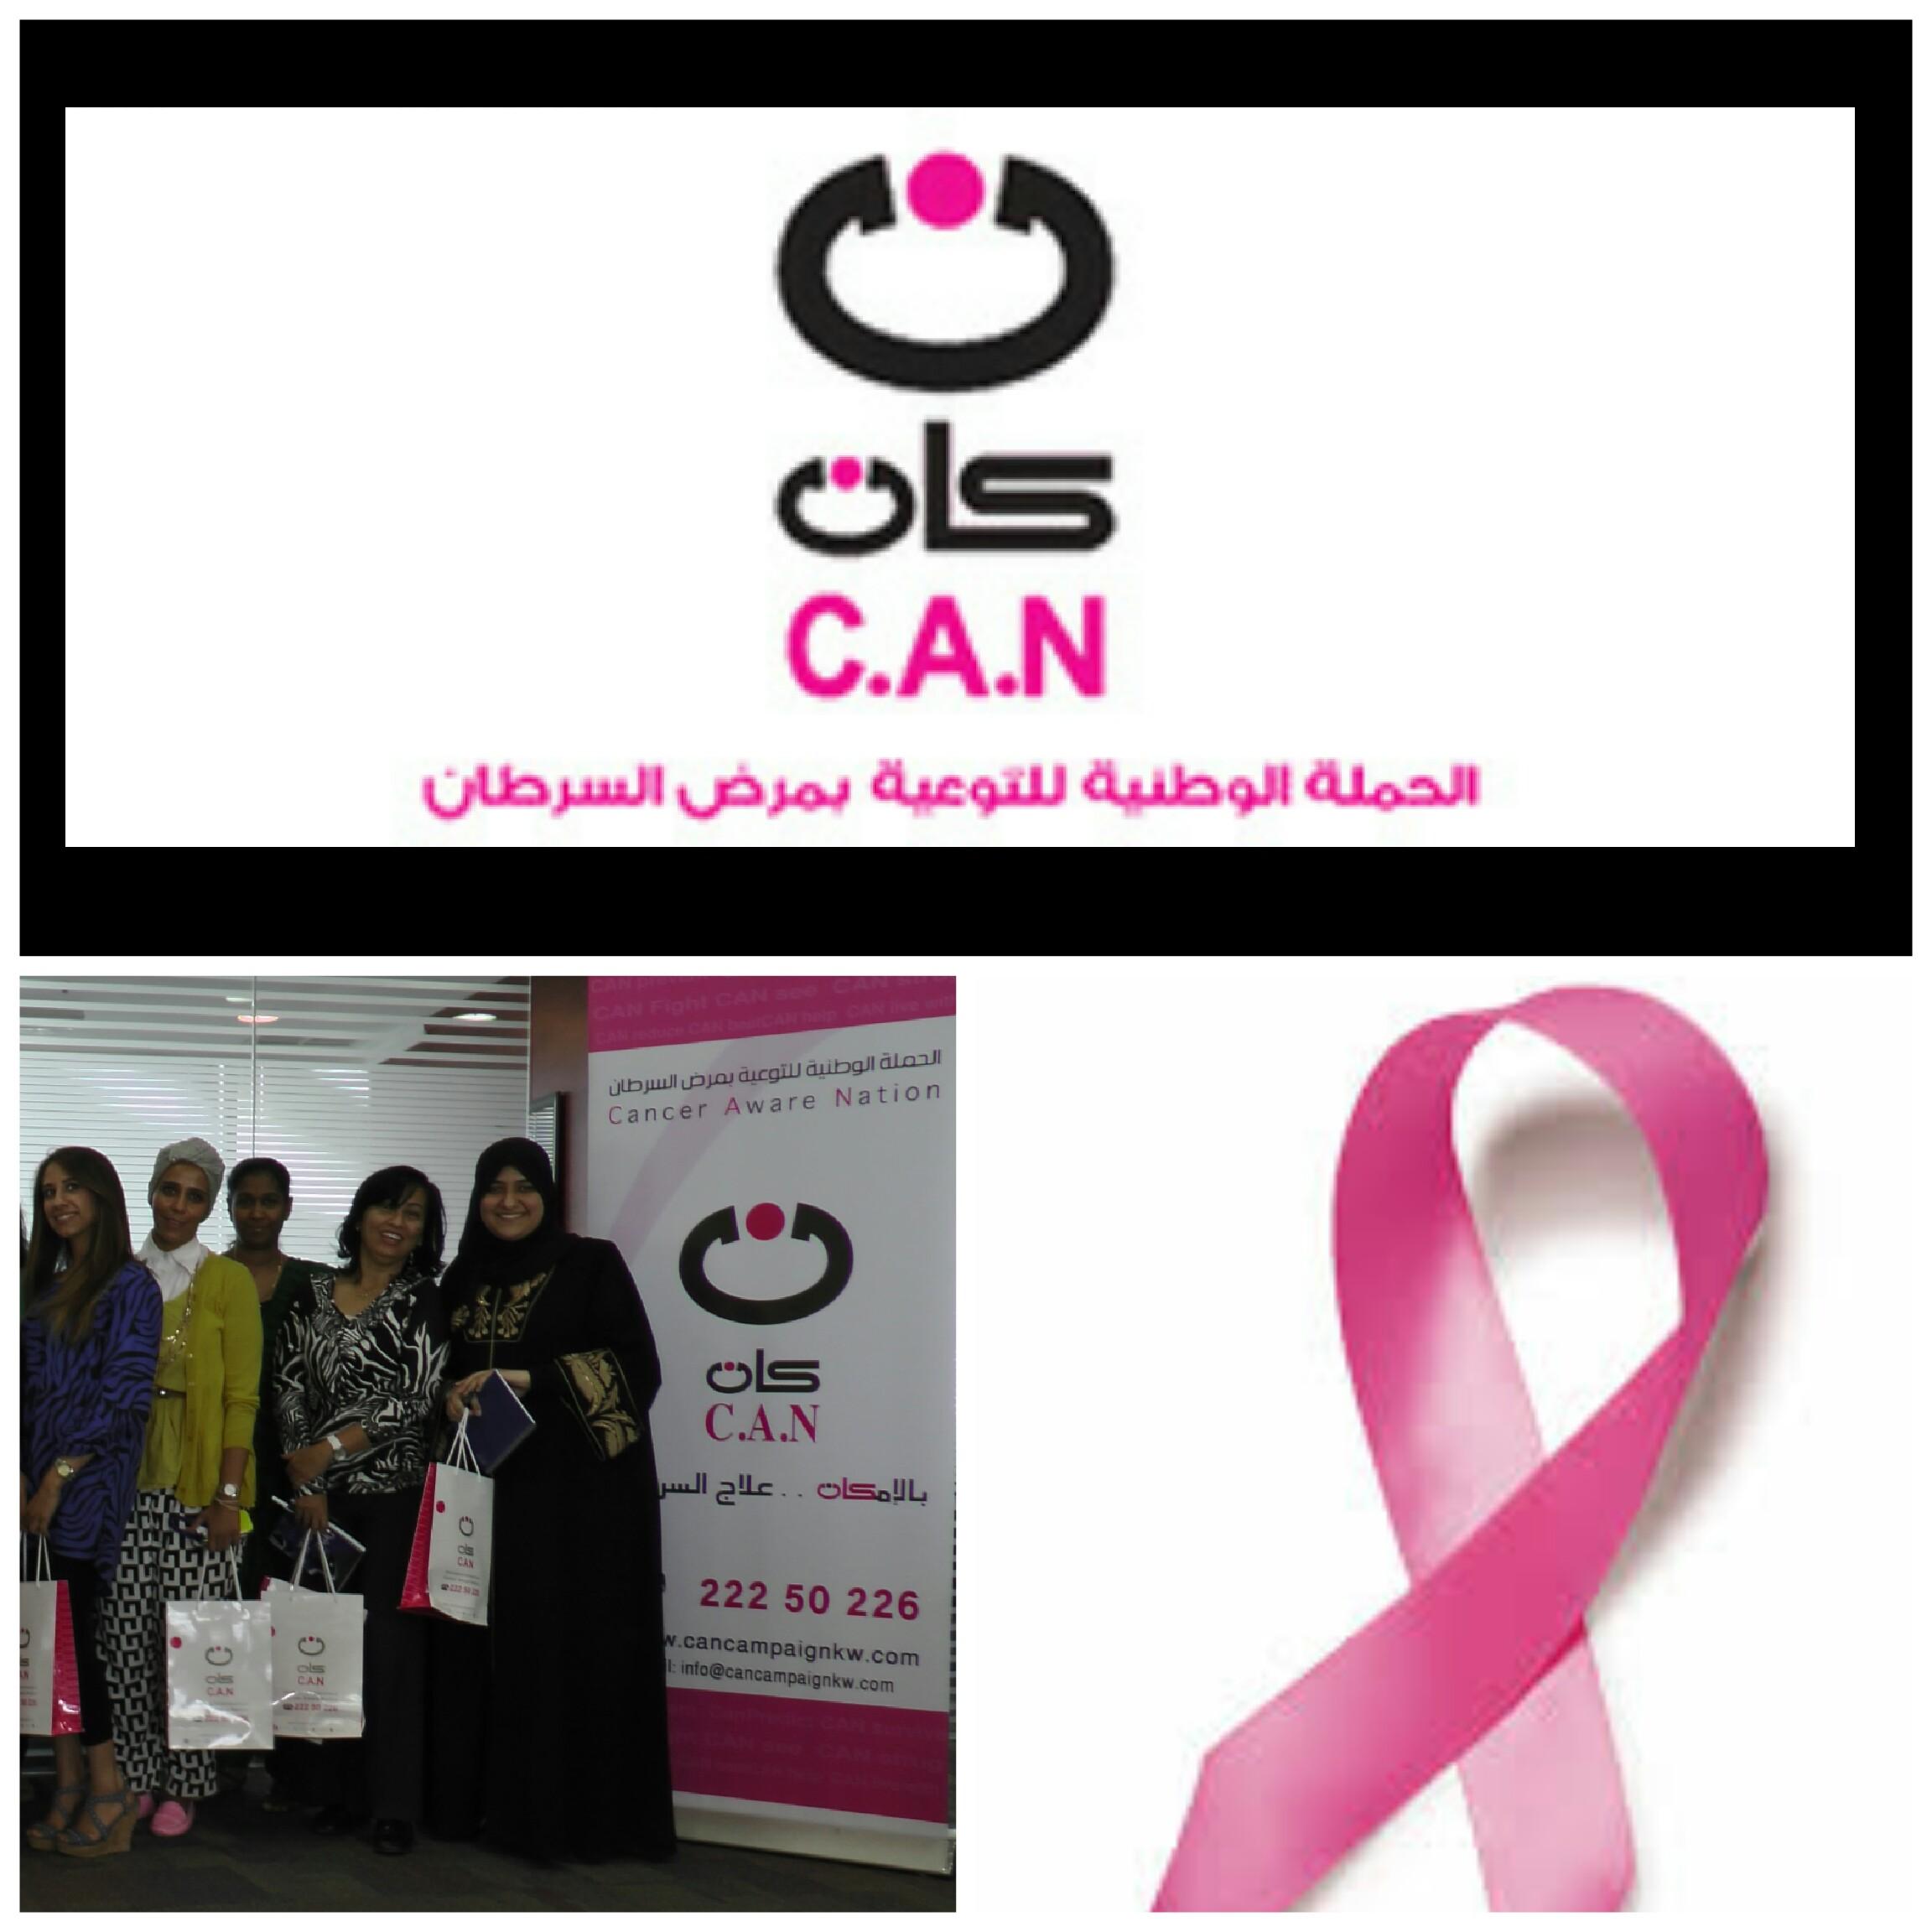 Cancer_awareness_at_360_mall_